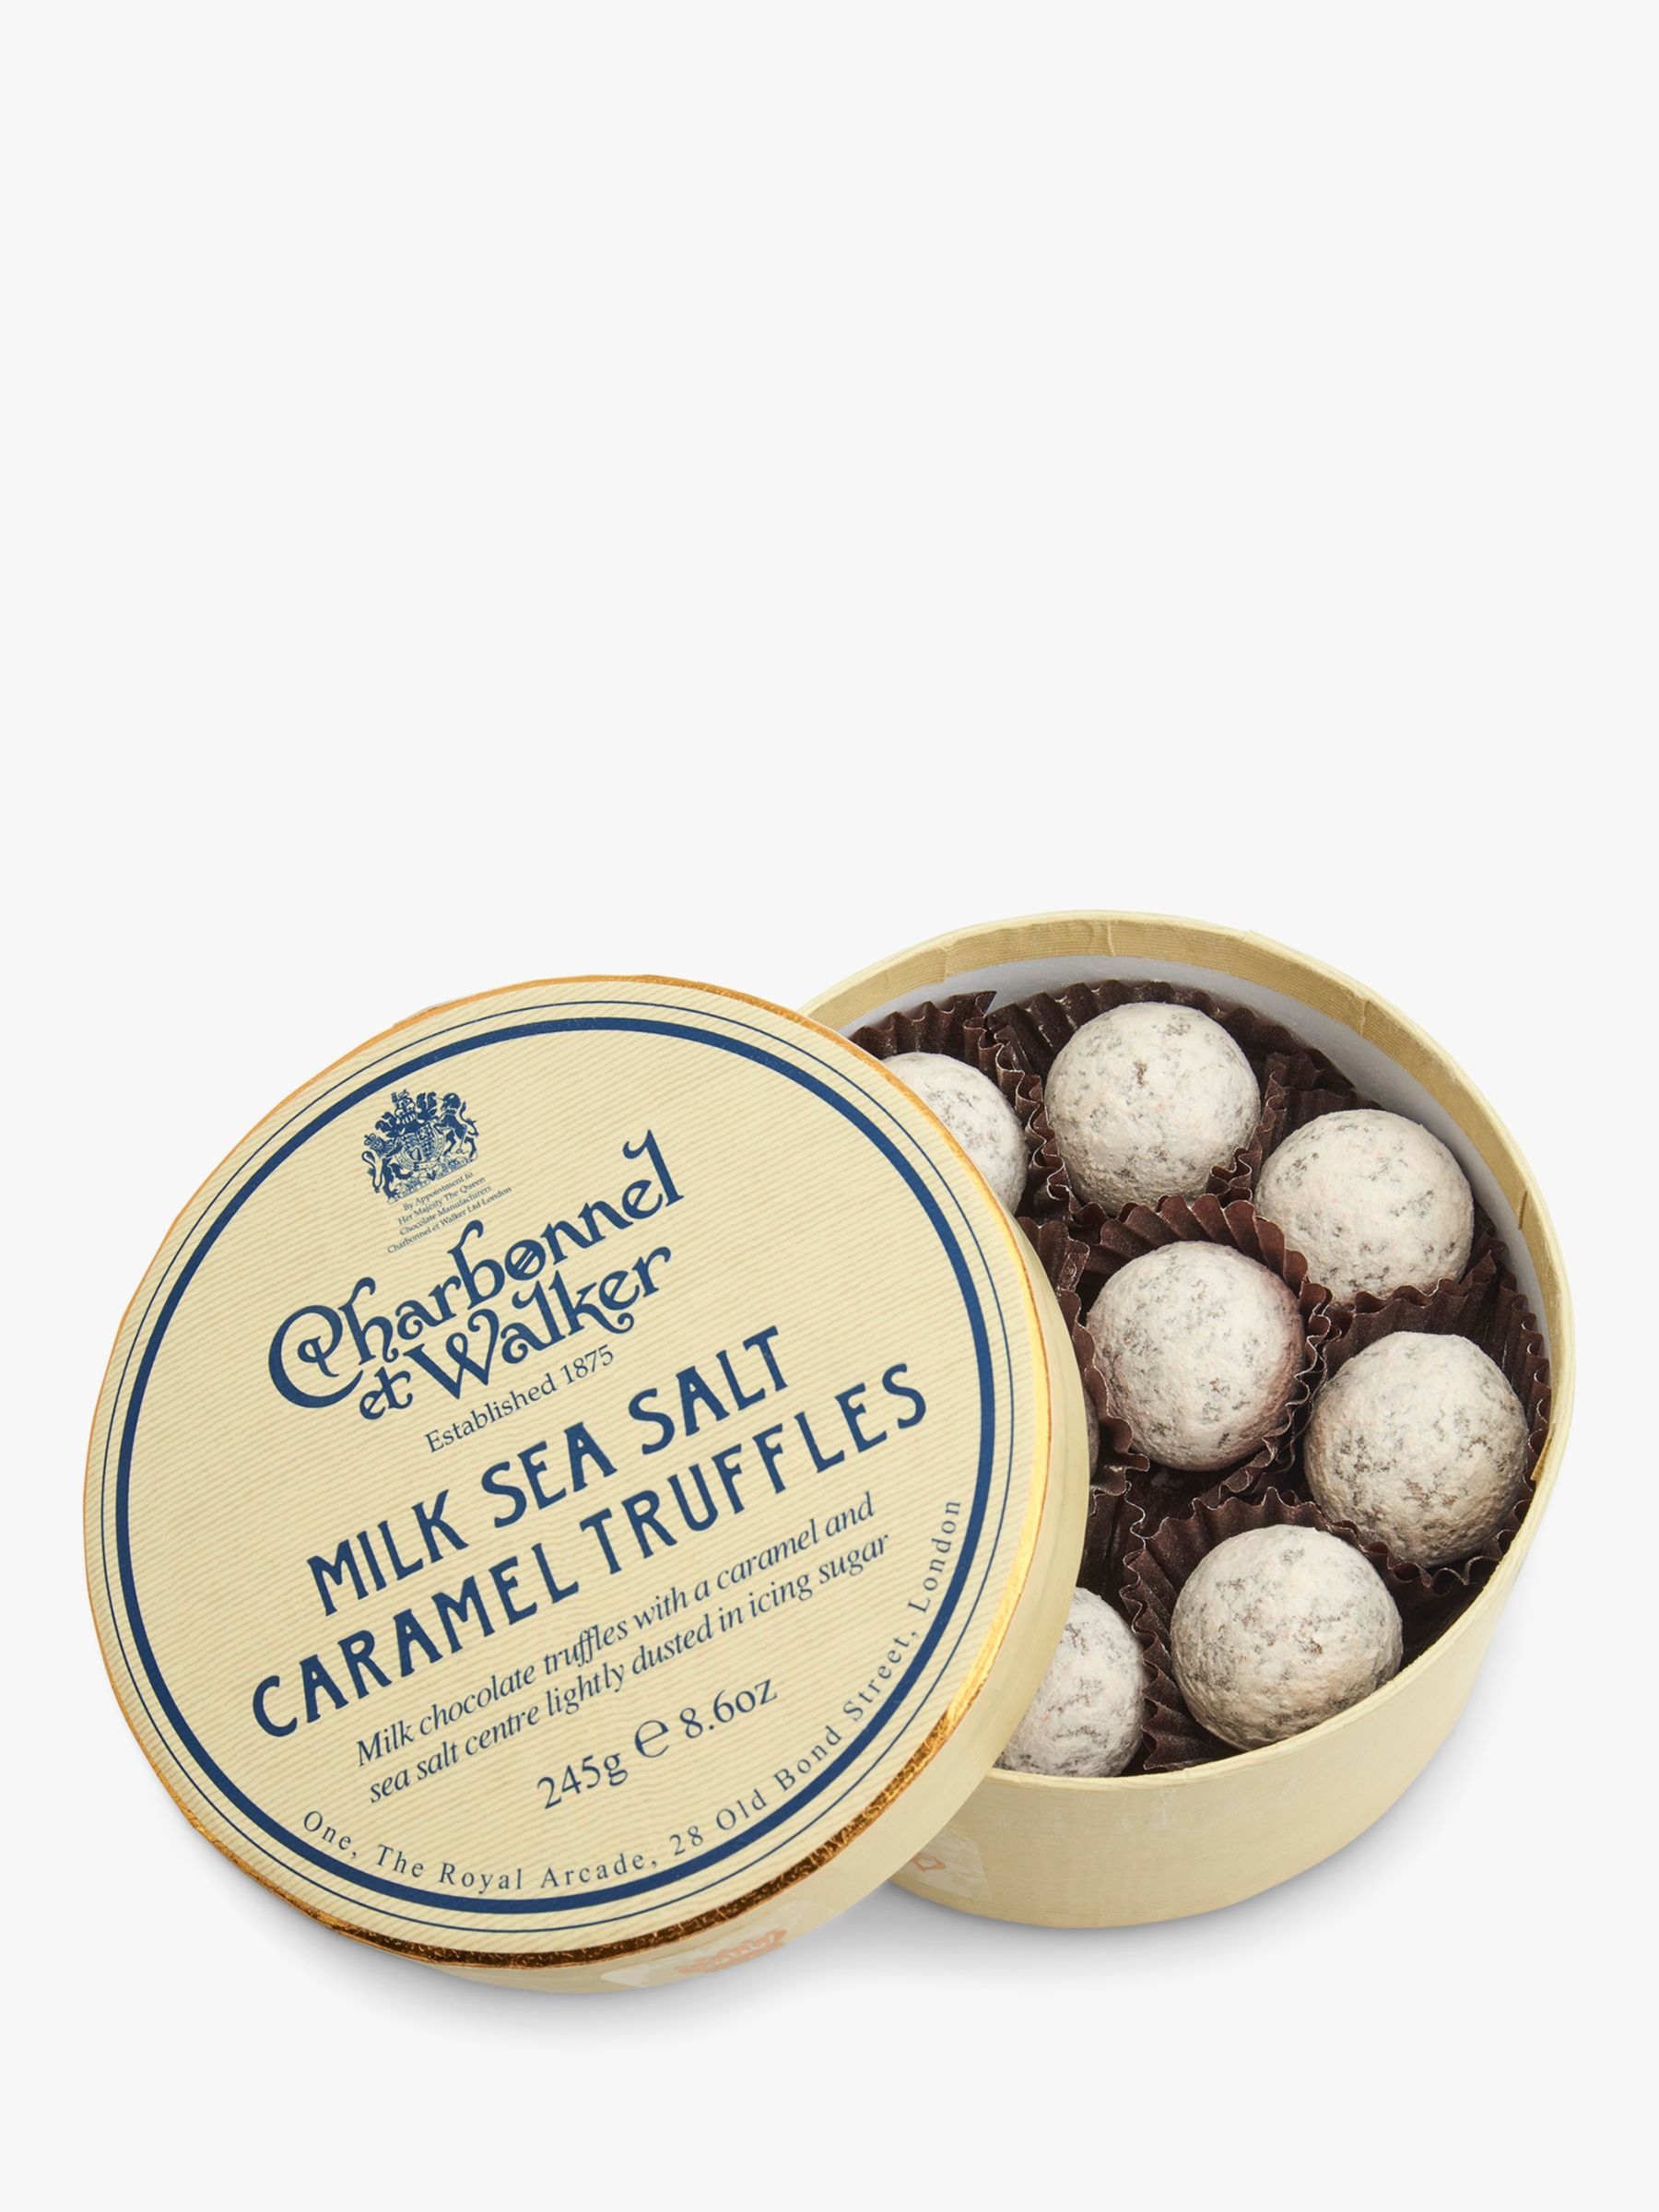 Charbonnel et Walker Charbonnel et Walker Seasalt Caramel Milk Truffles, 245g